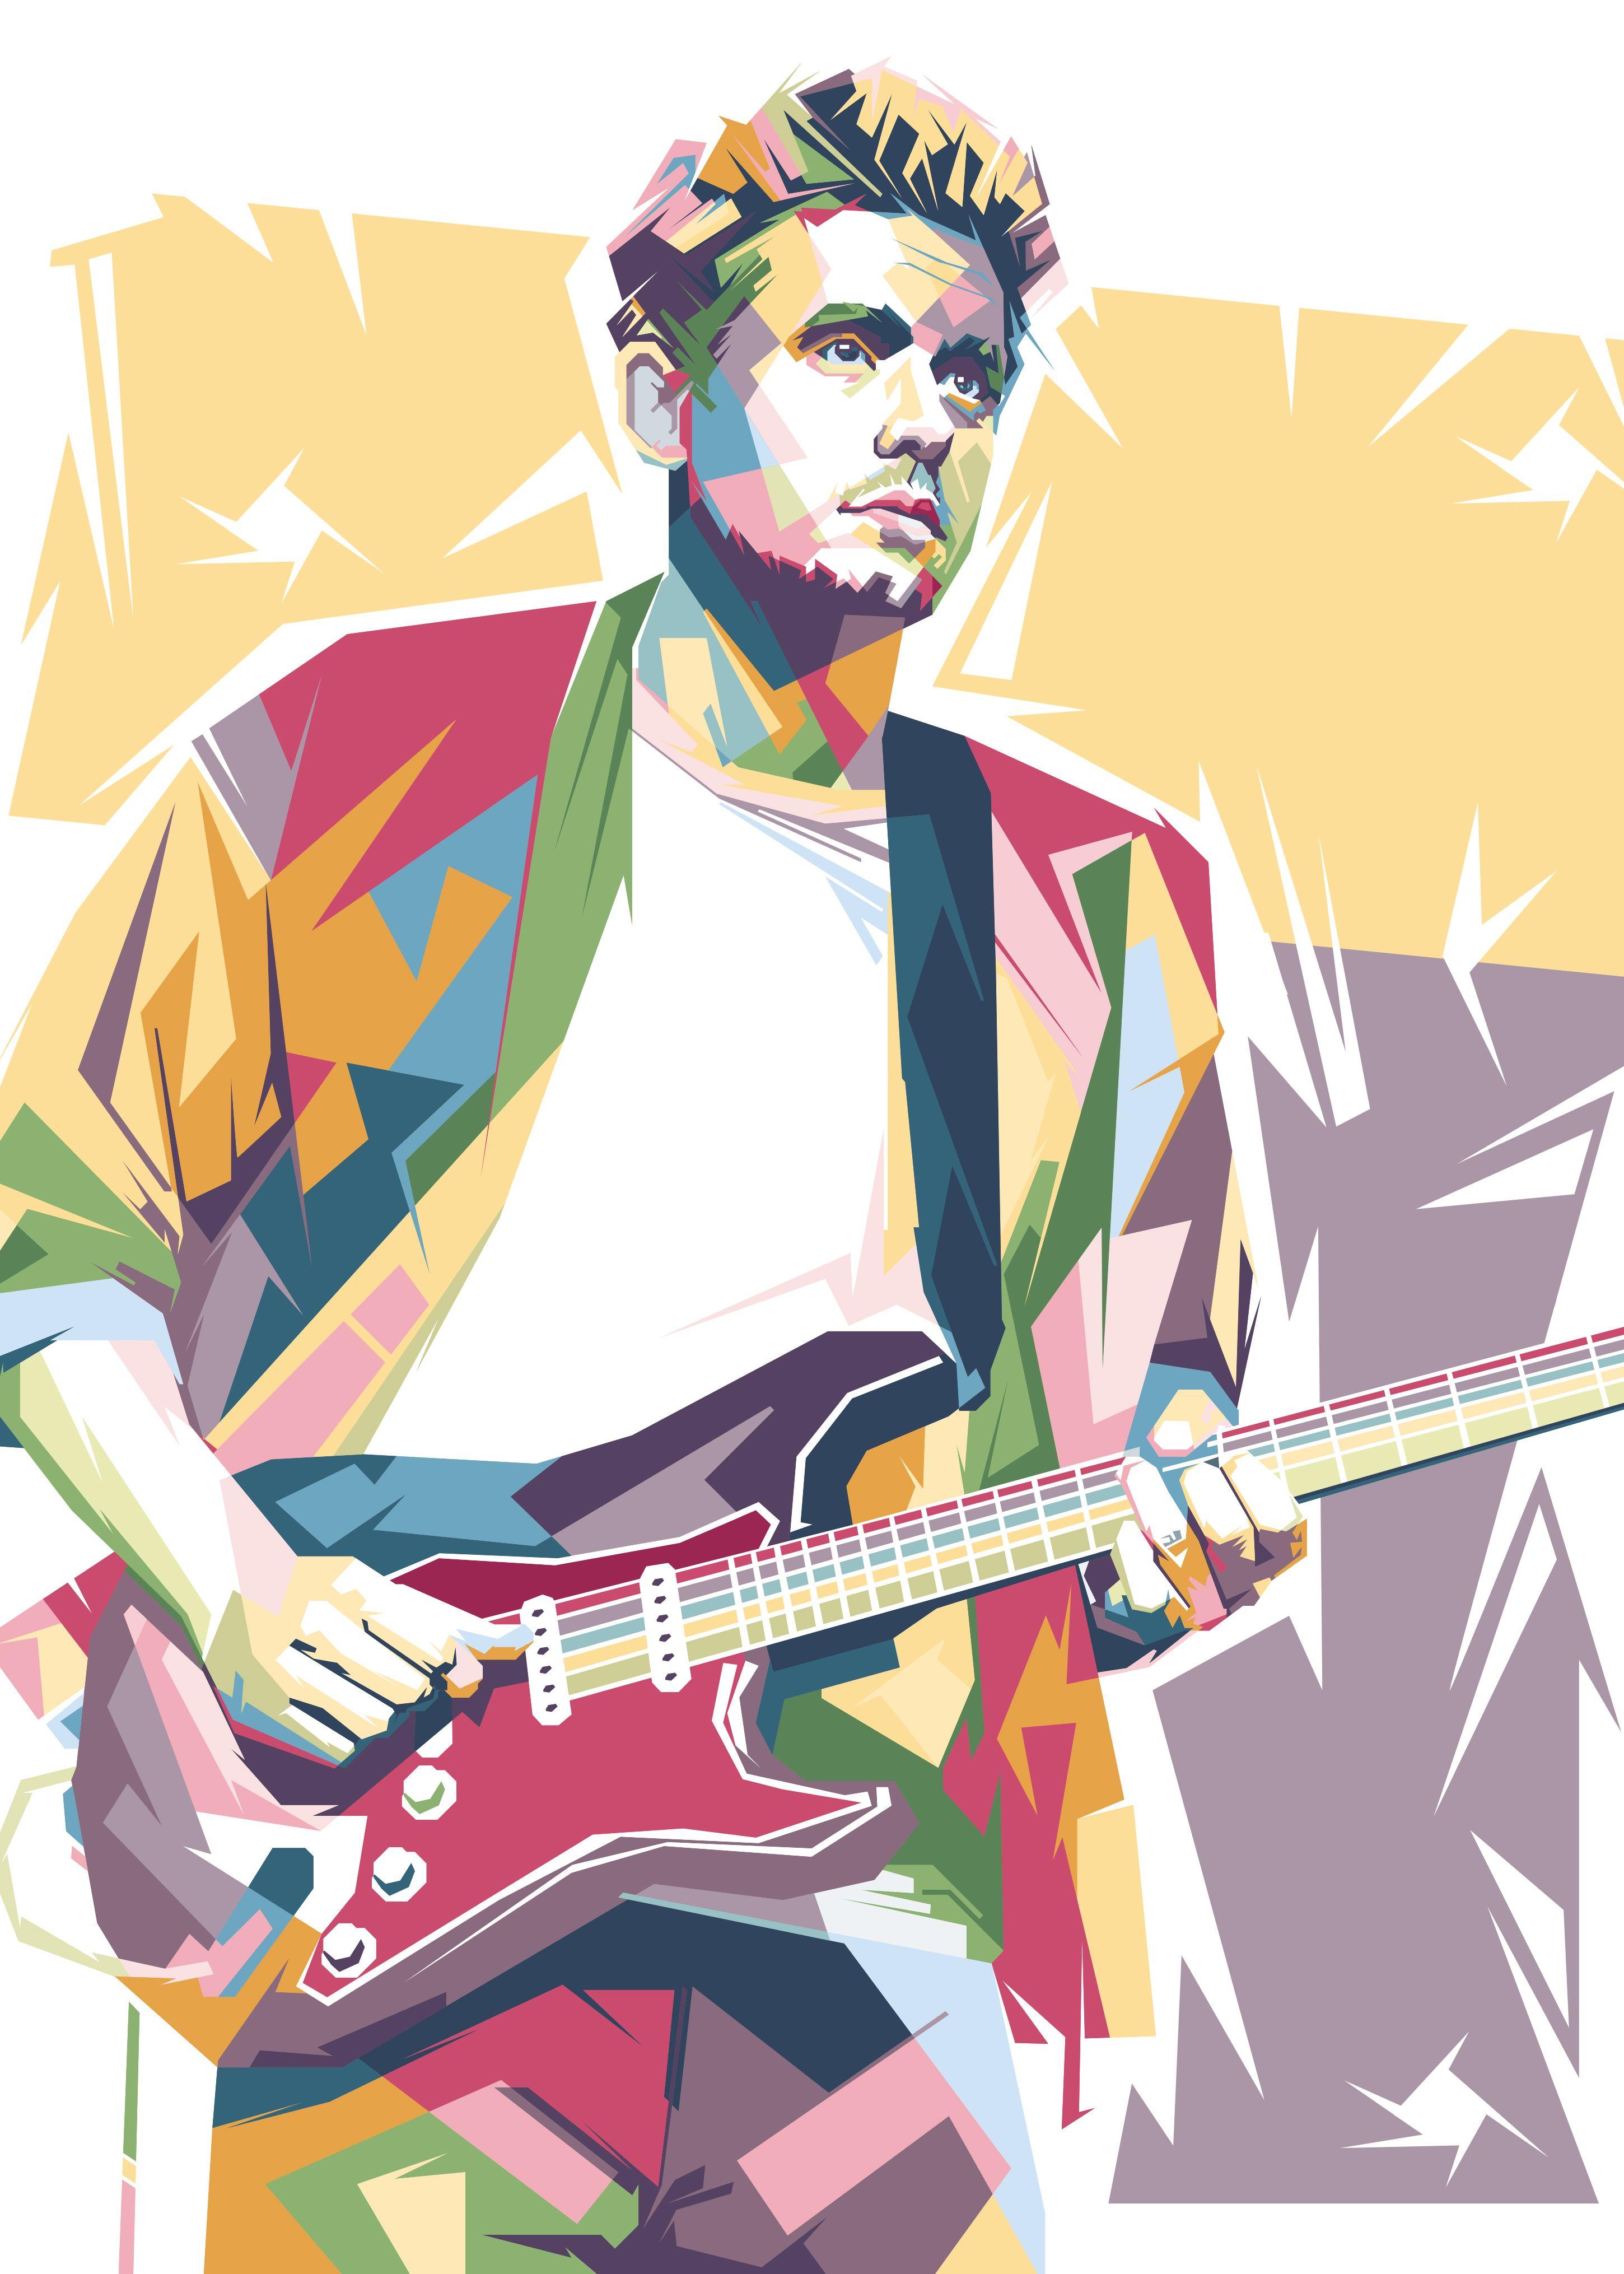 john mayer poster by johan musa